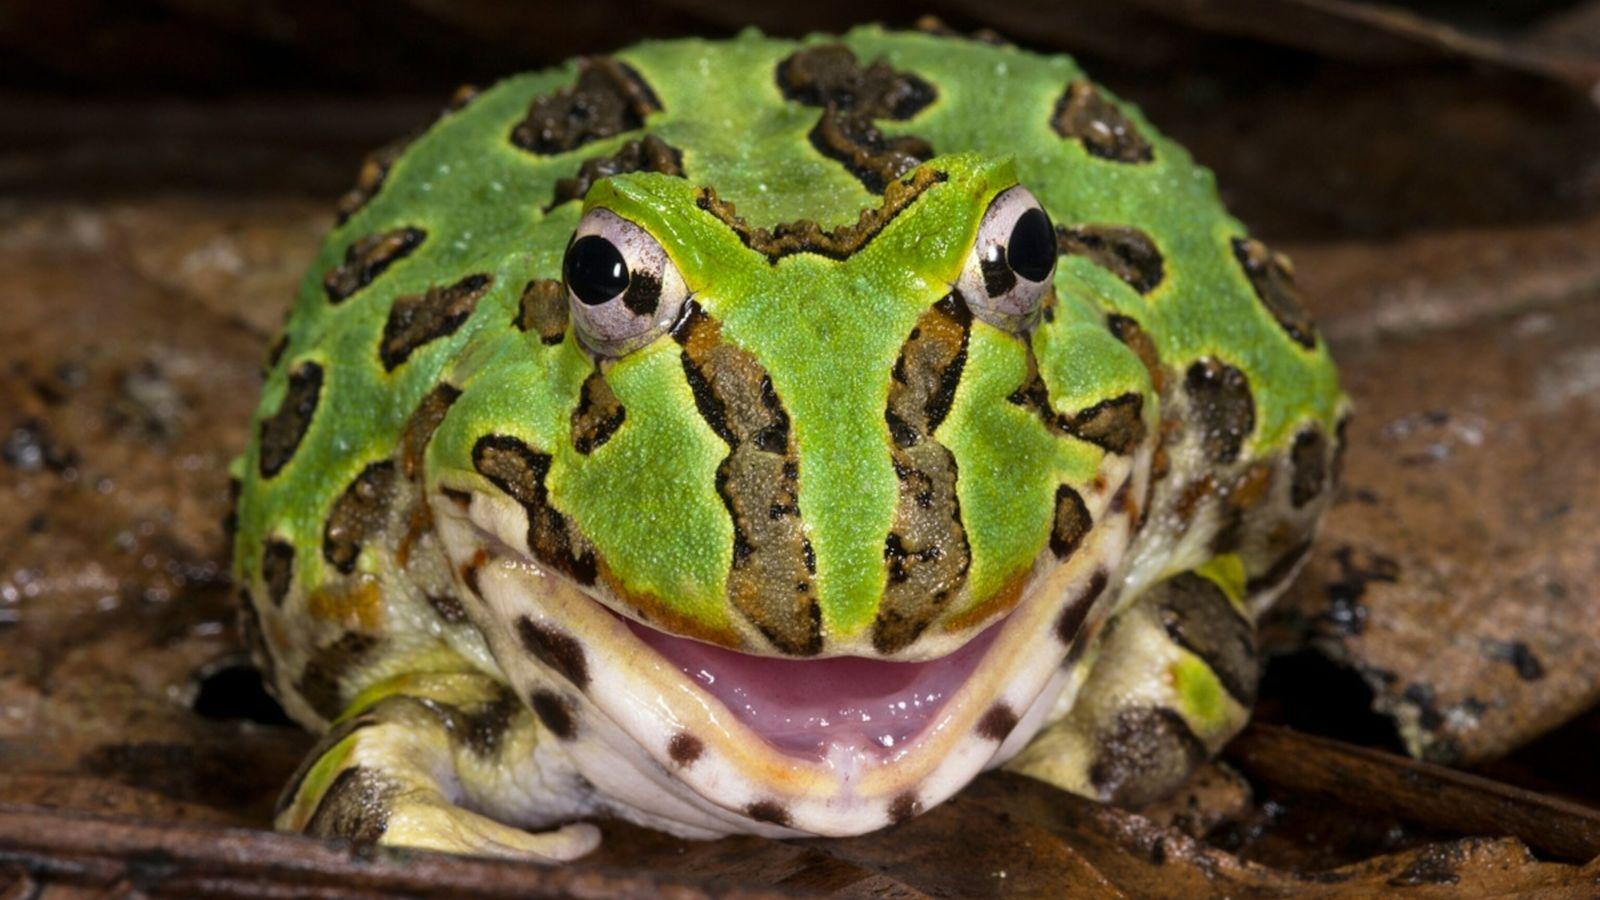 Frog - World Animal Day